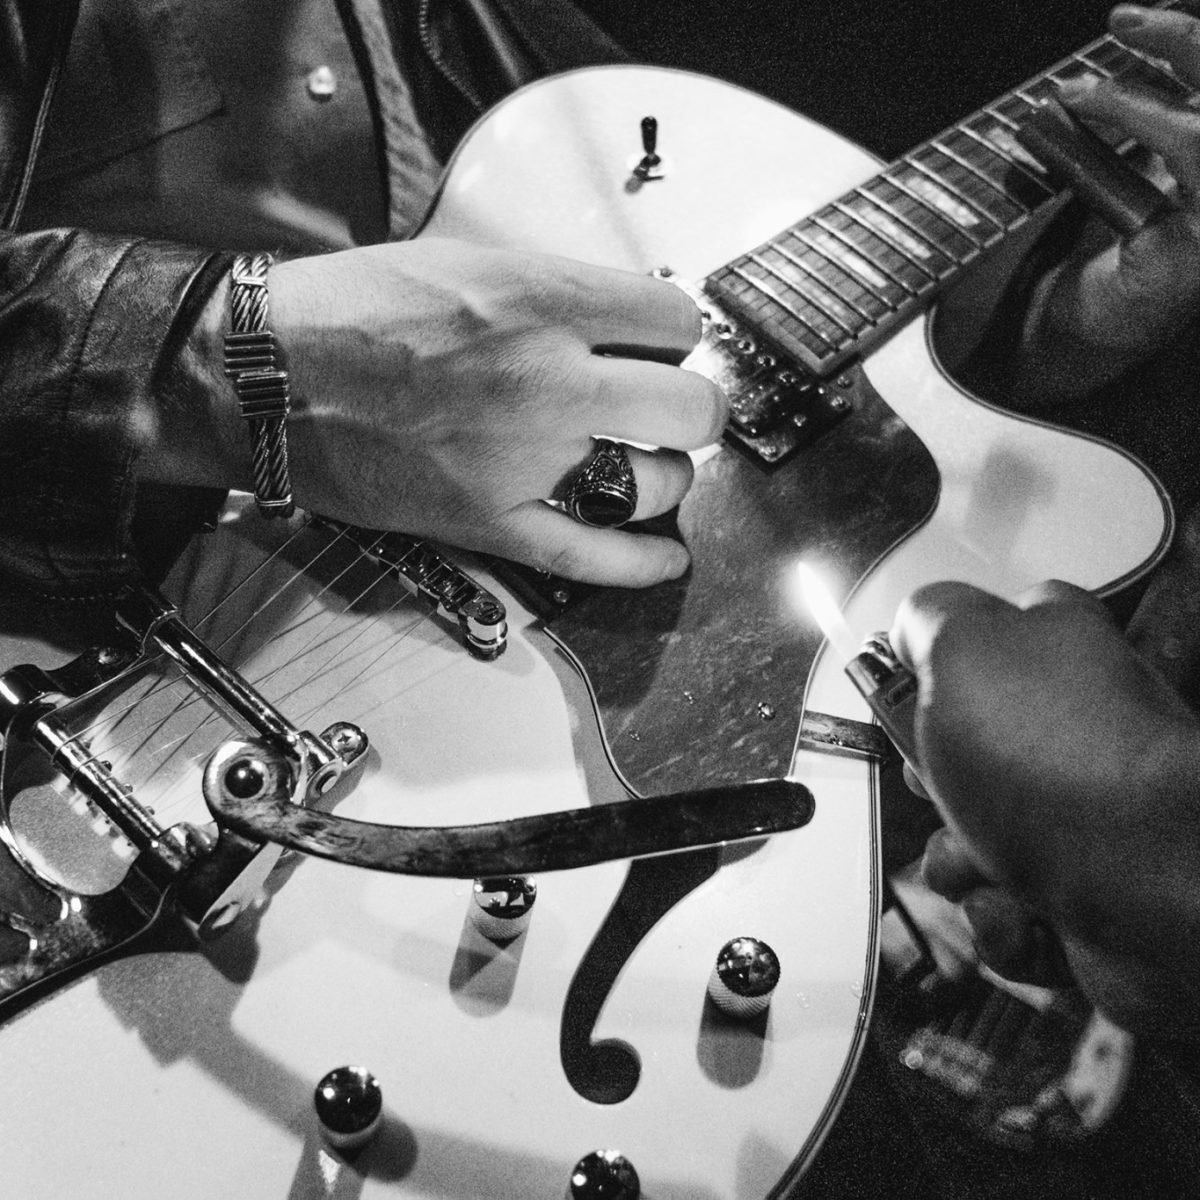 Wizard-Sex-Guitar-Player